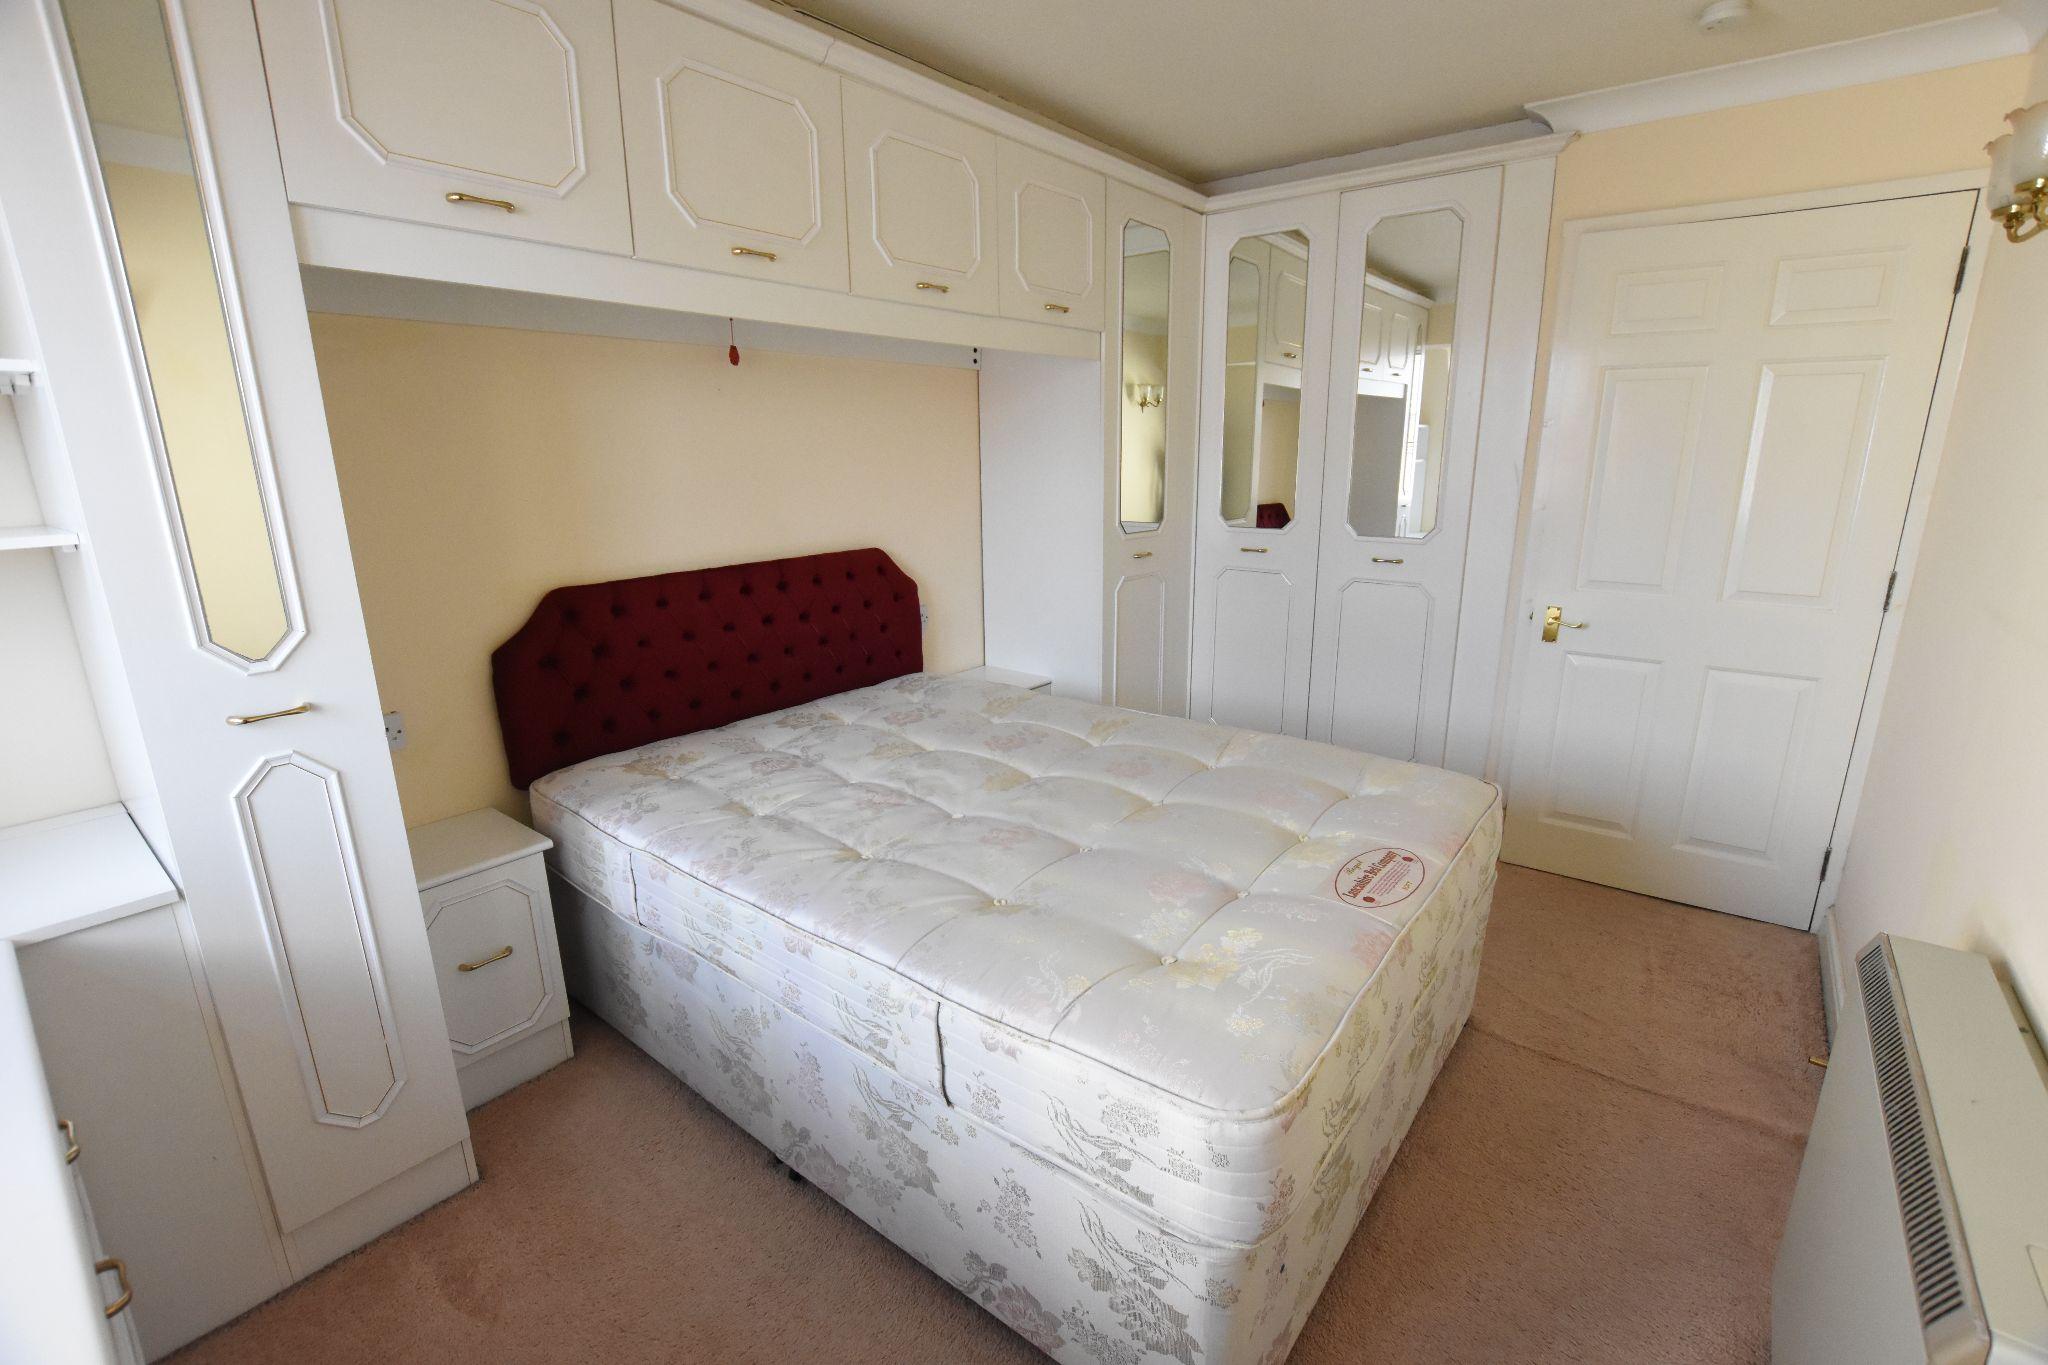 1 bedroom apartment flat/apartment Sold STC in Preston - BEDROOM